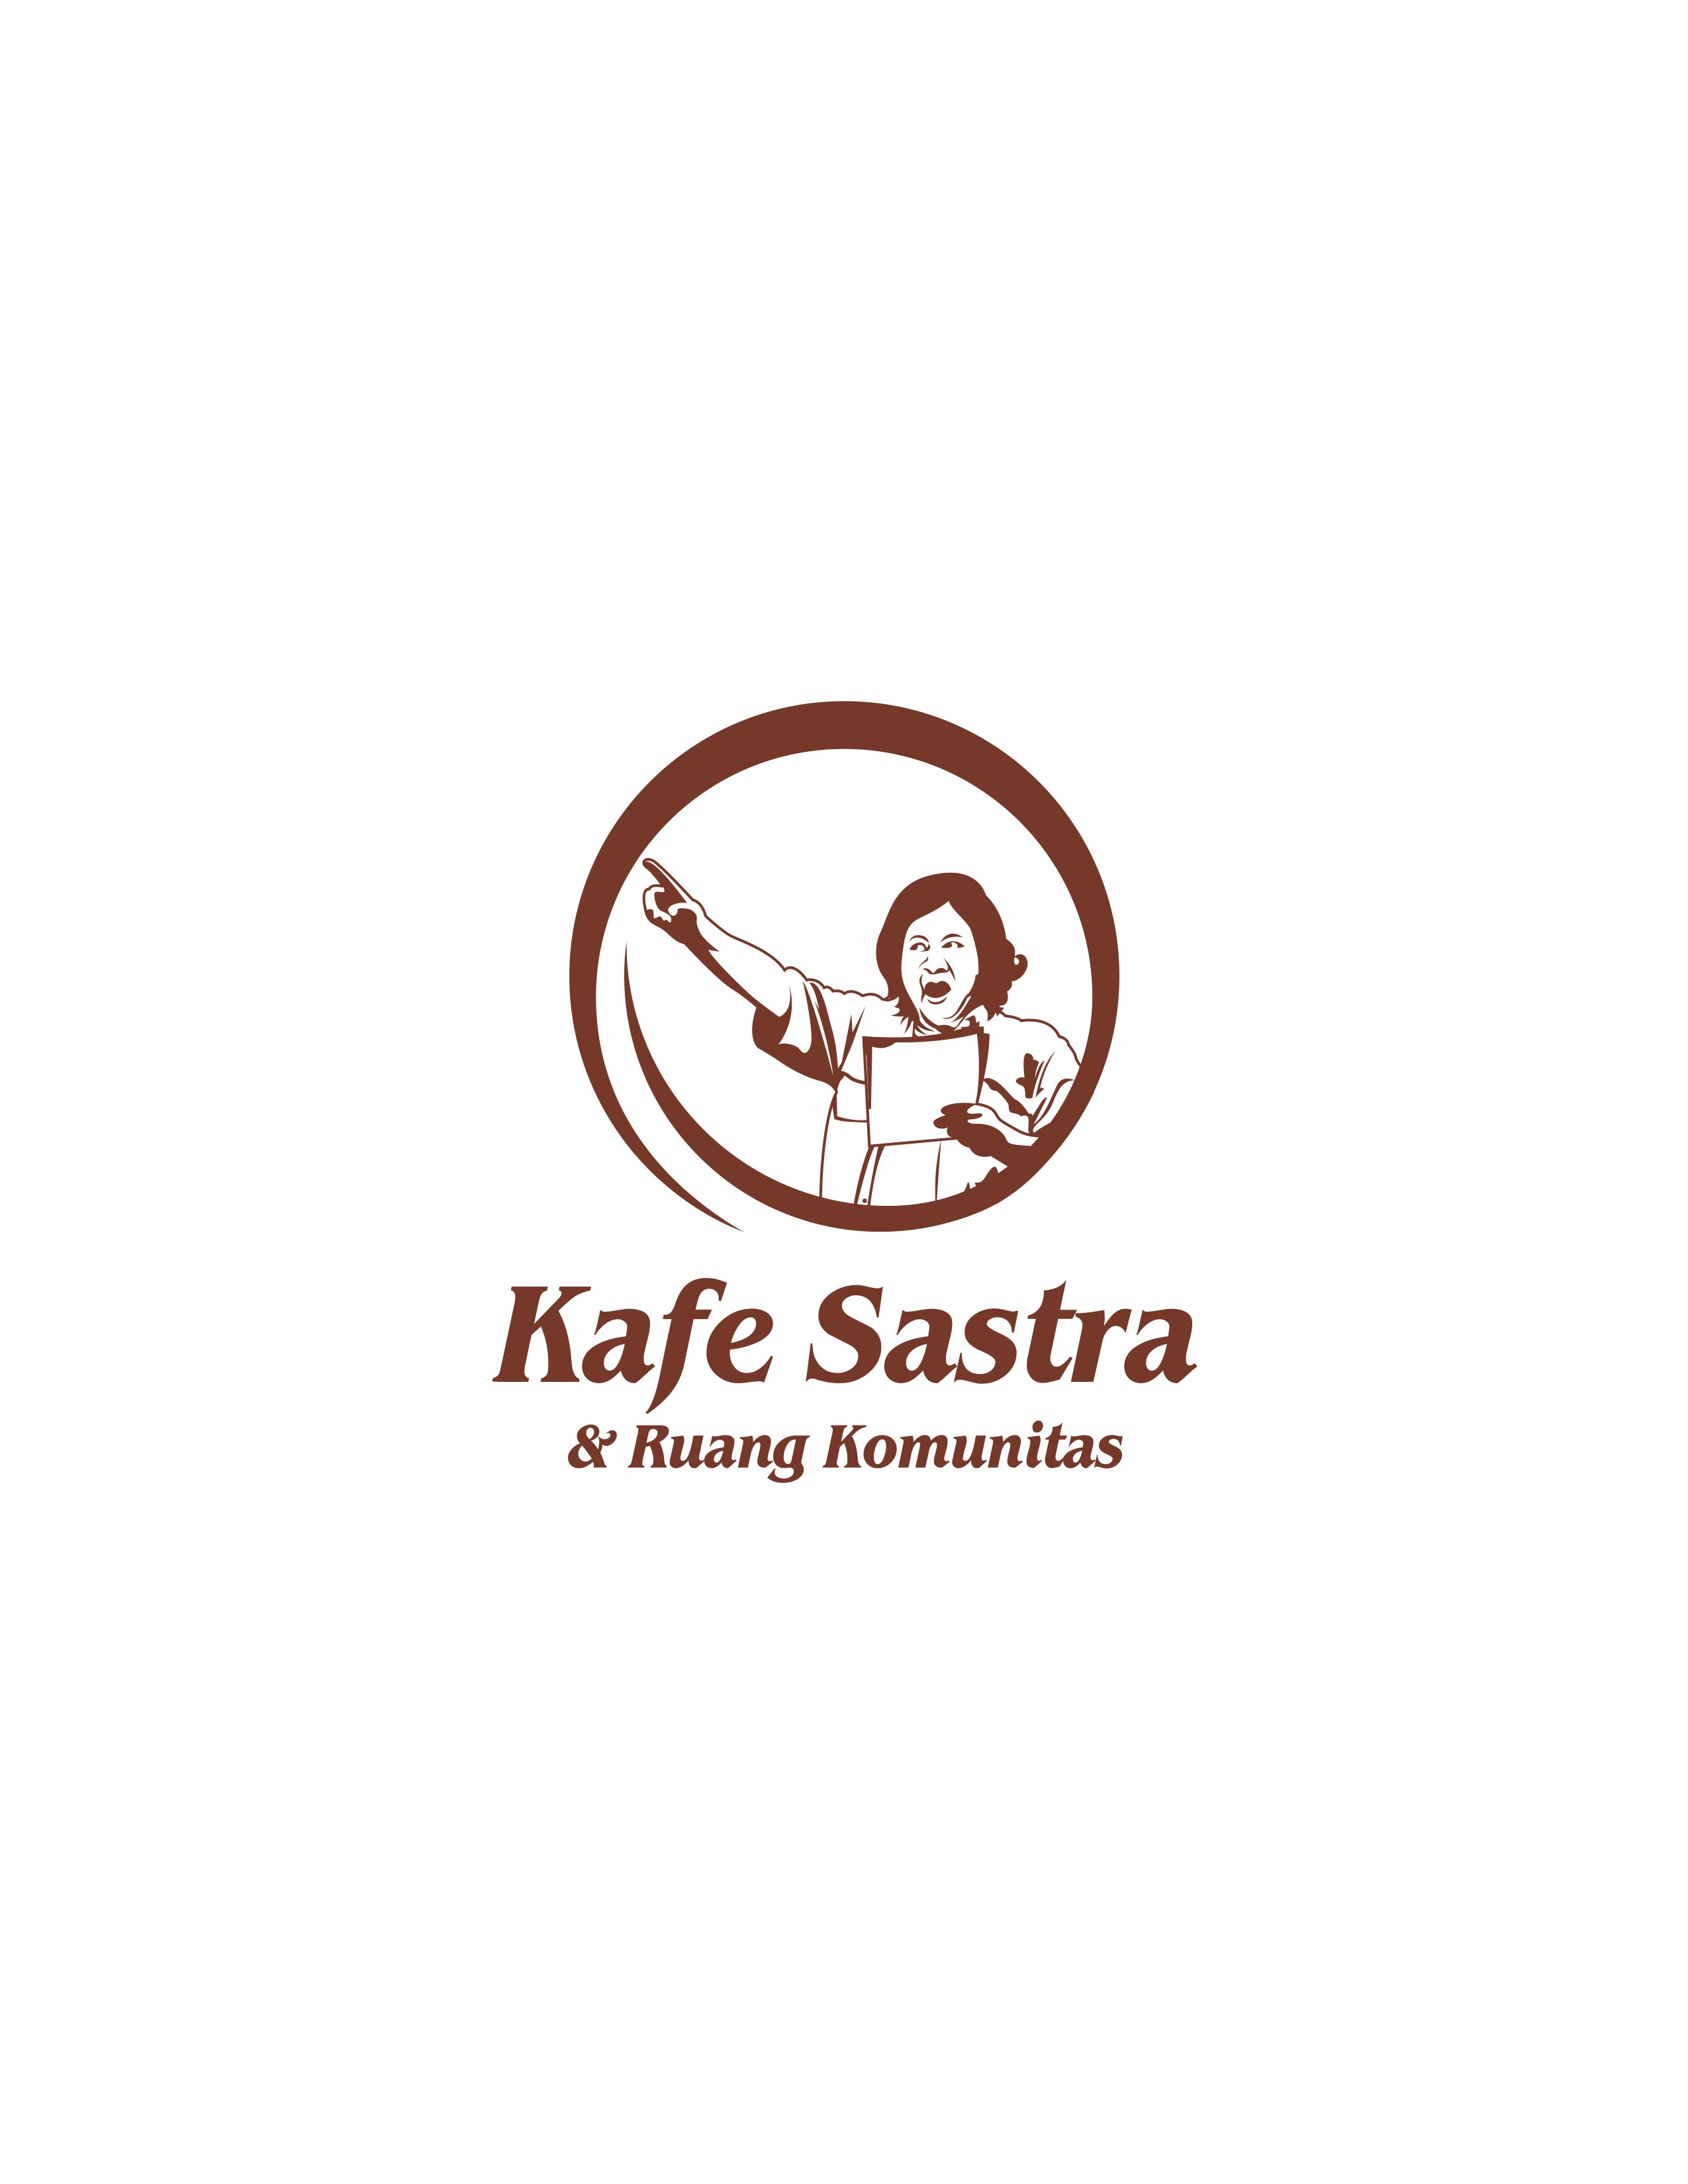 Logo kafe sastra untuk celemek